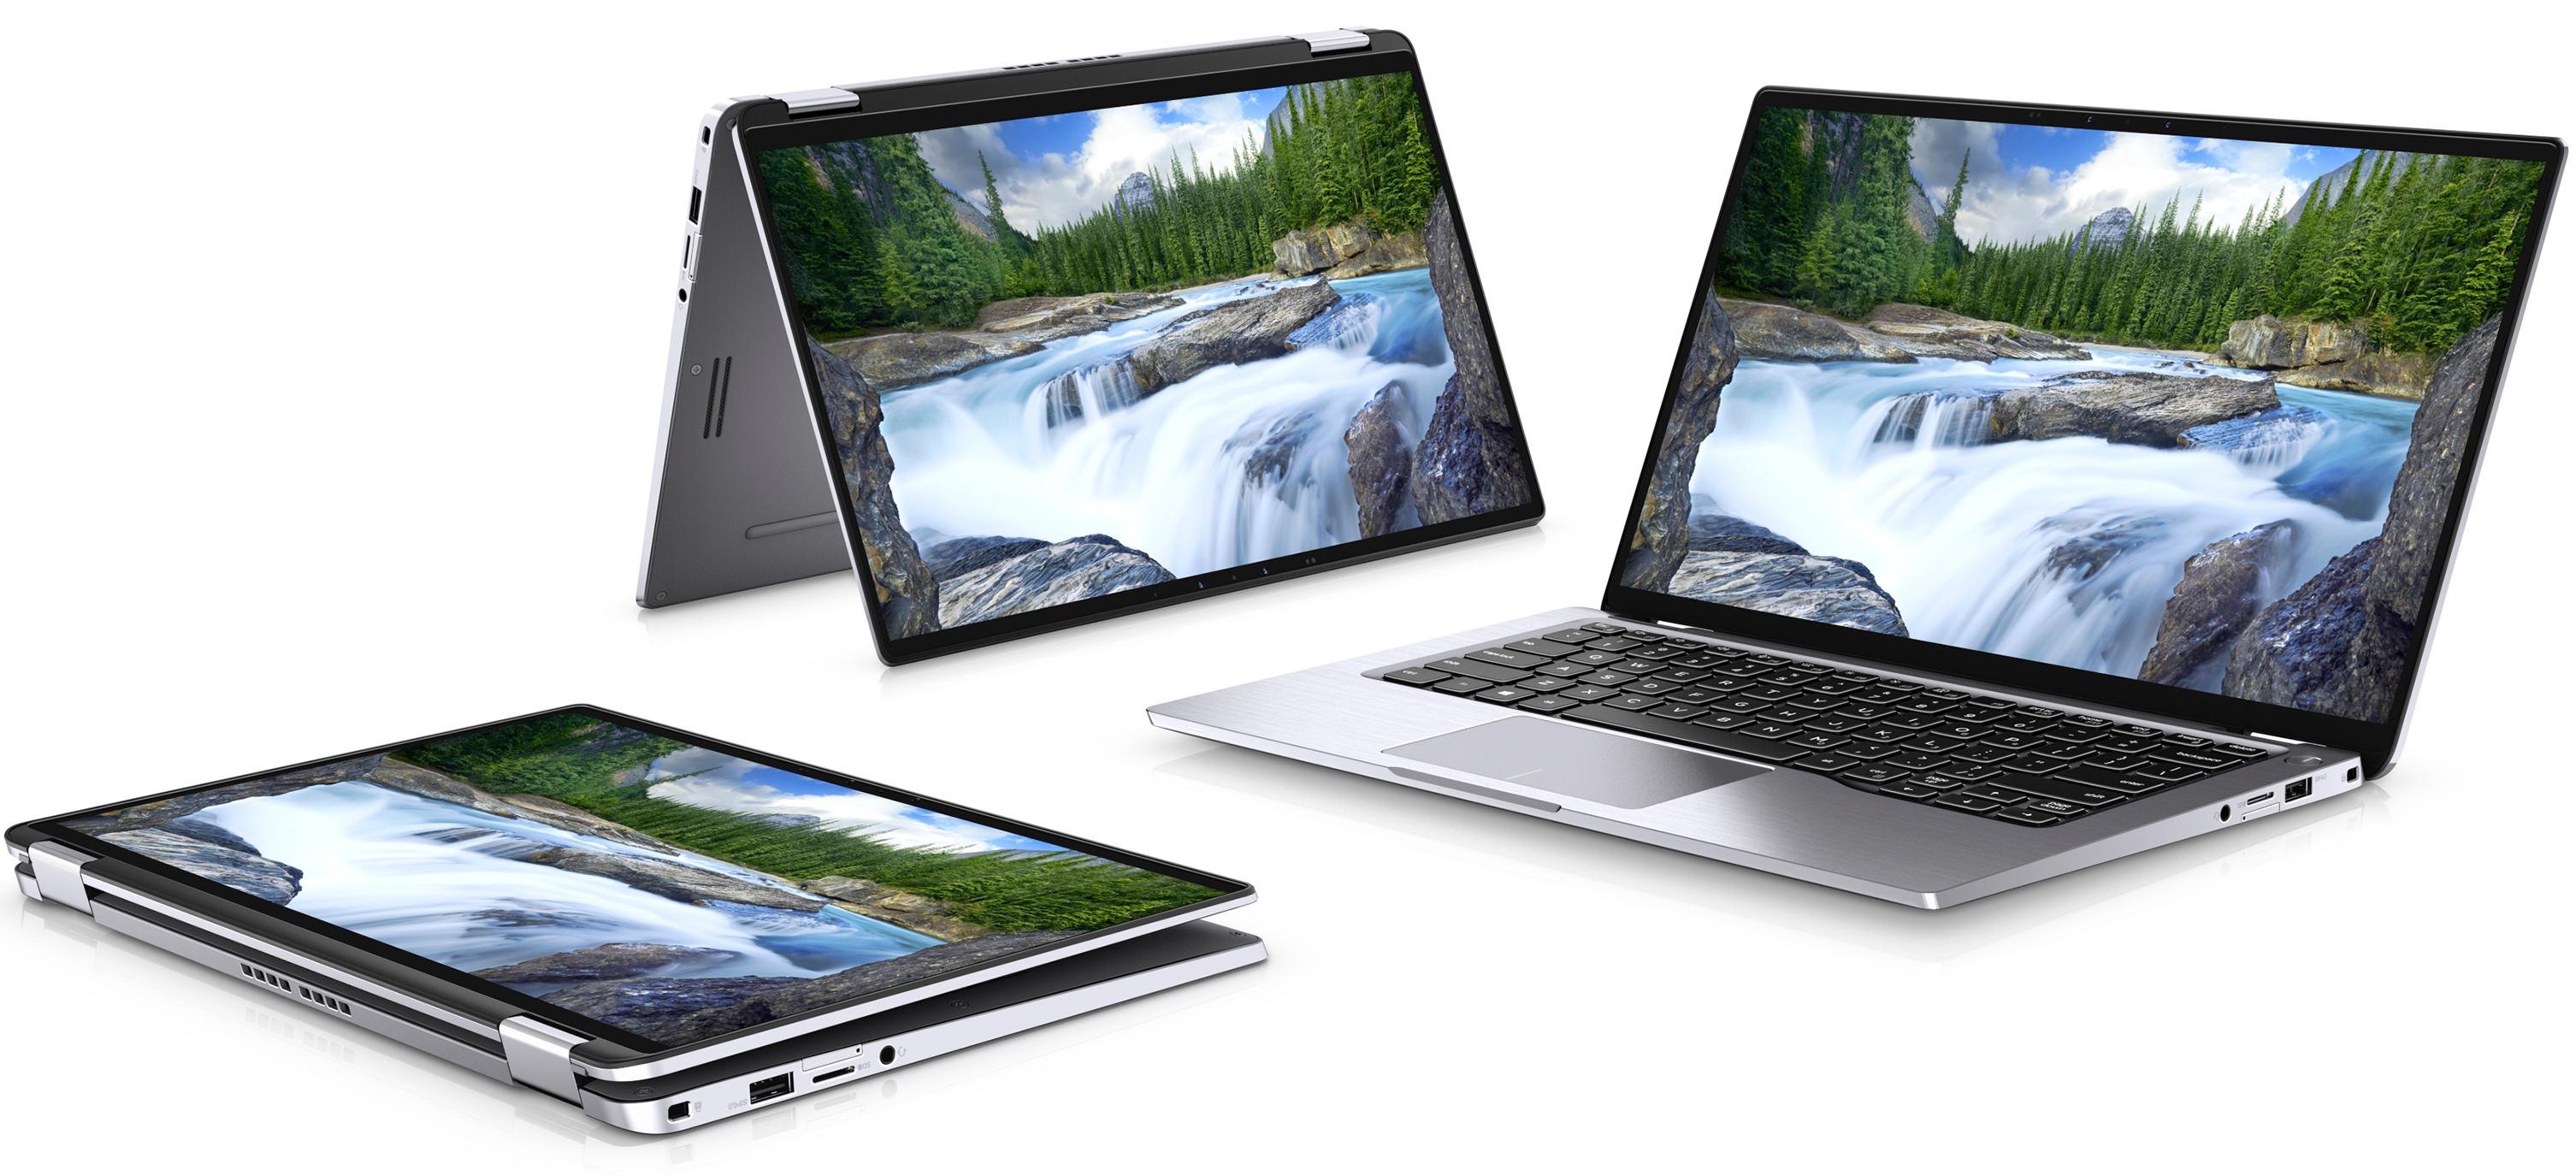 Dell XPS One 24 Intel Proximity Sensor Windows 7 64-BIT